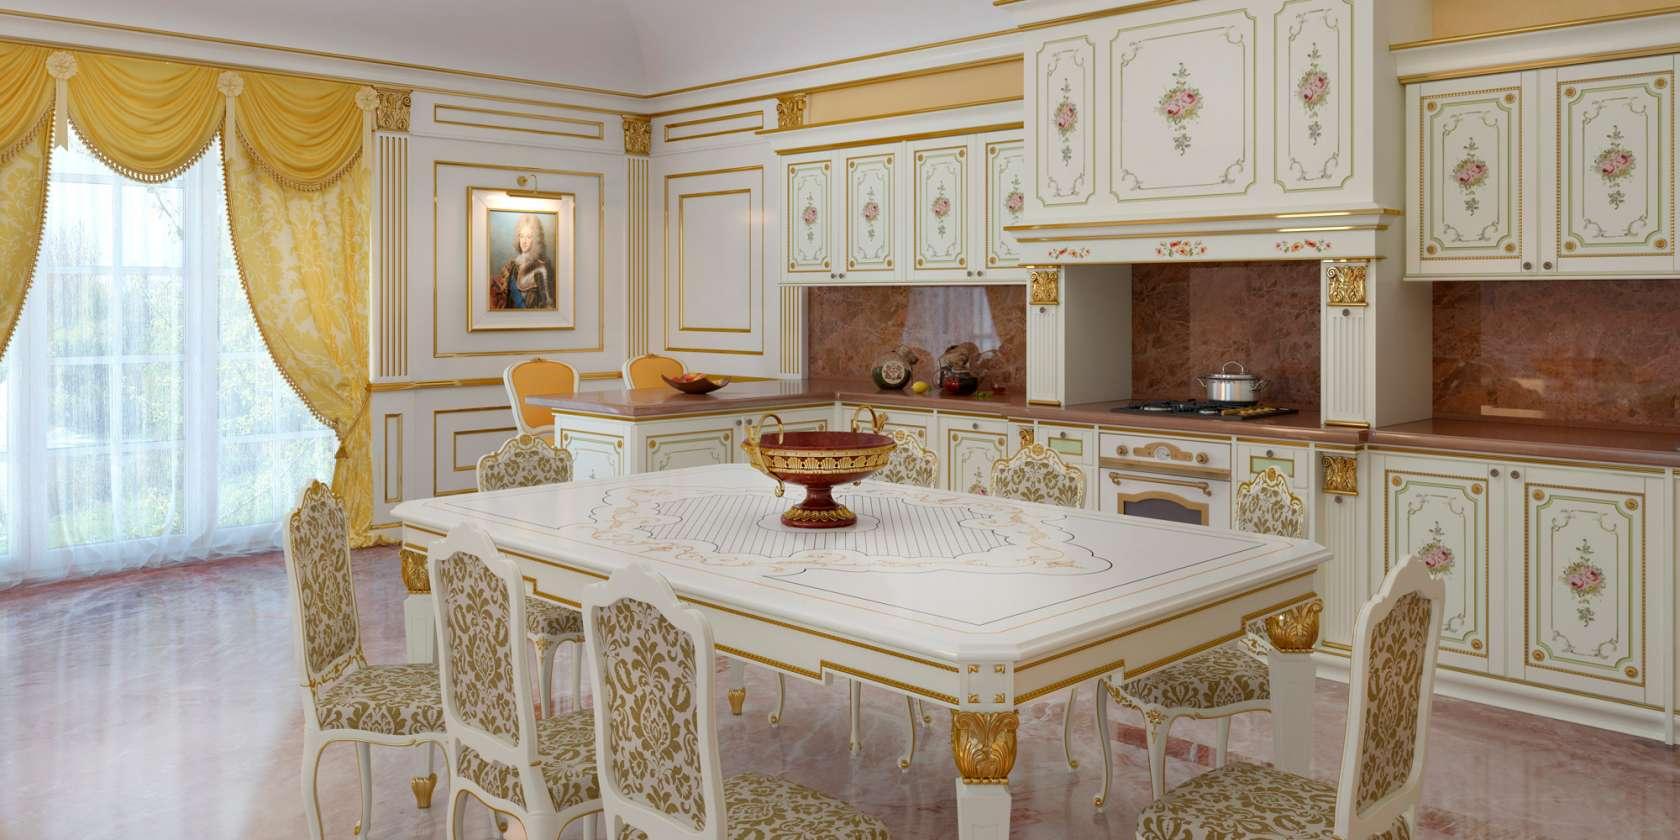 Кухонный стол в стиле ампир